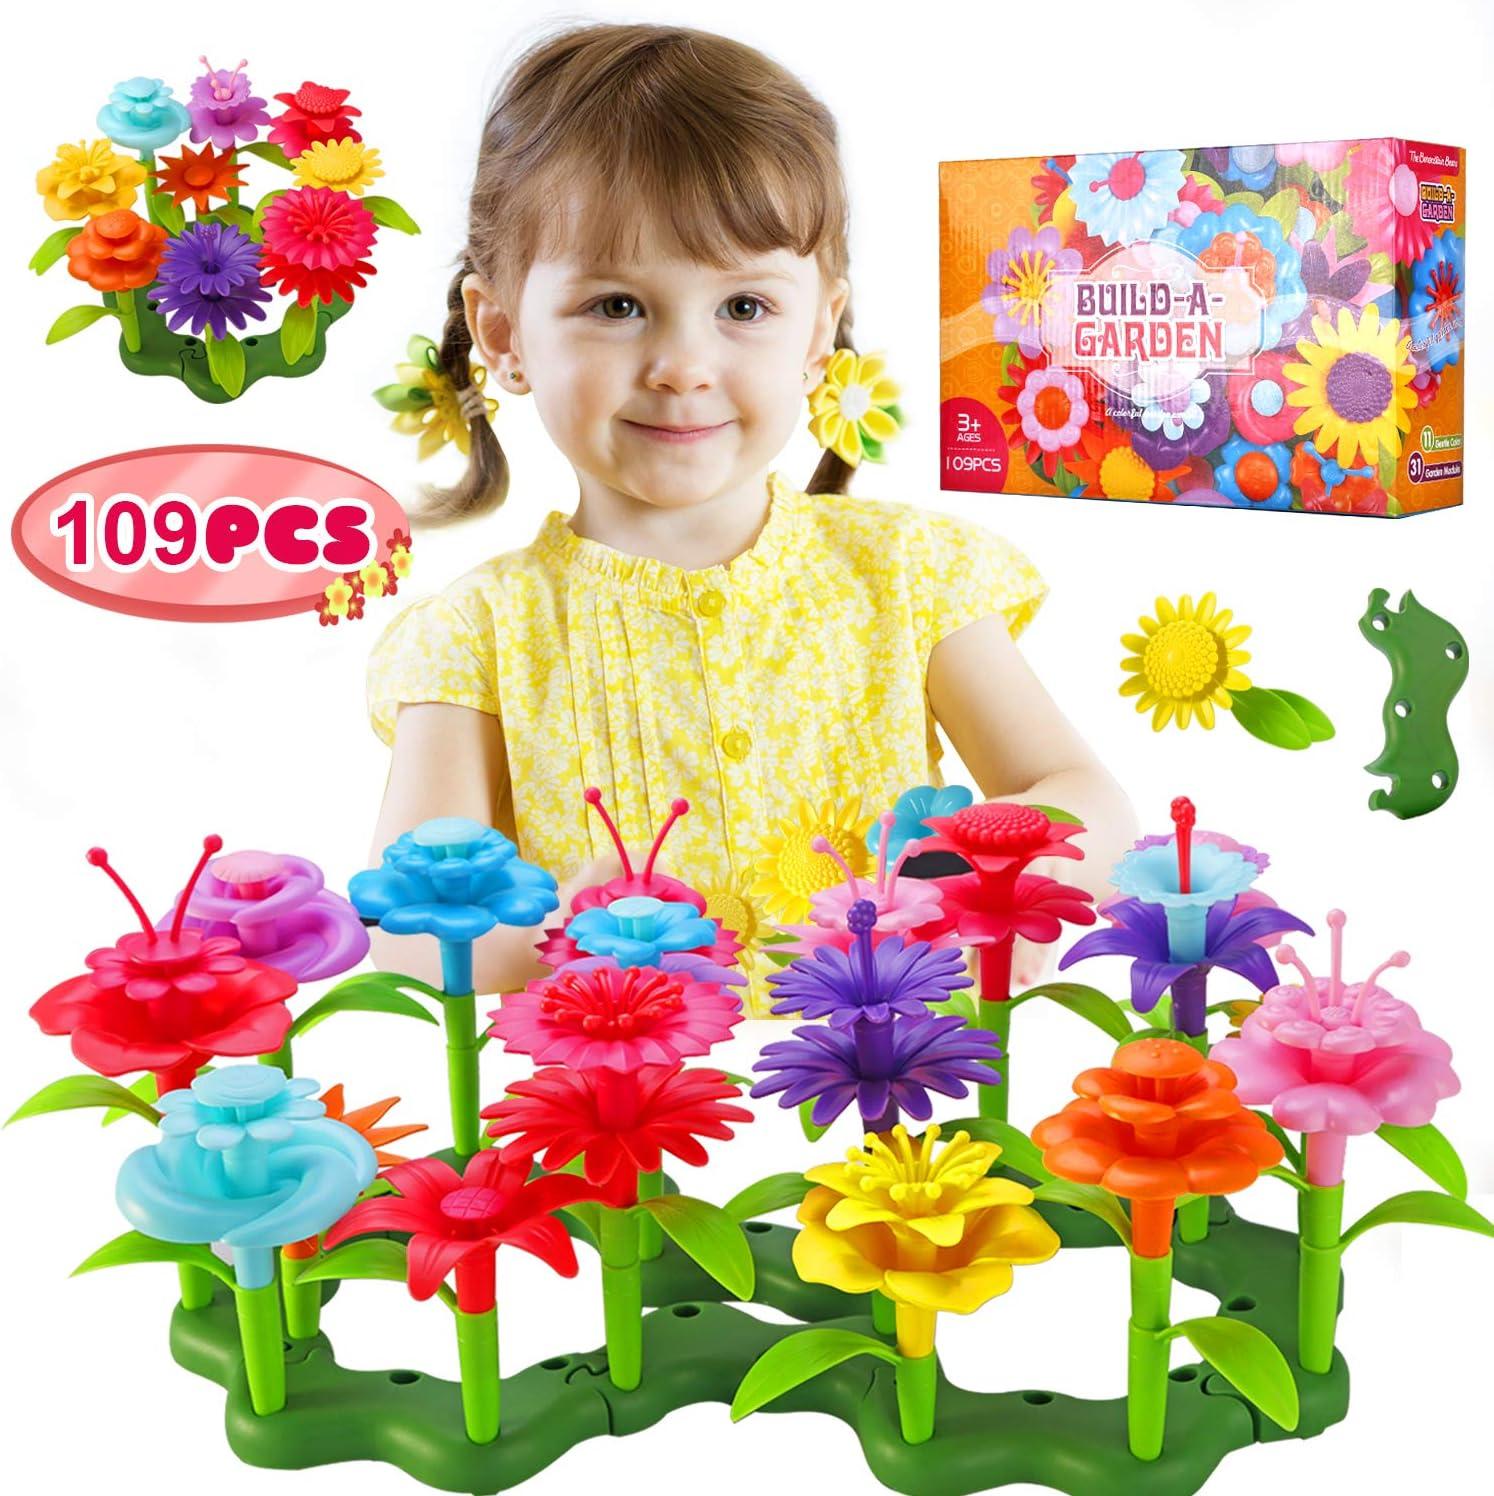 TURN RAISE Flower Garden Building Toys for Girls,109 Pcs Garden Bouquet Blocks,Creative Educational Stem Toys for for Preschool Children Age 3 4 5 6 7 Year Old (Style-2)